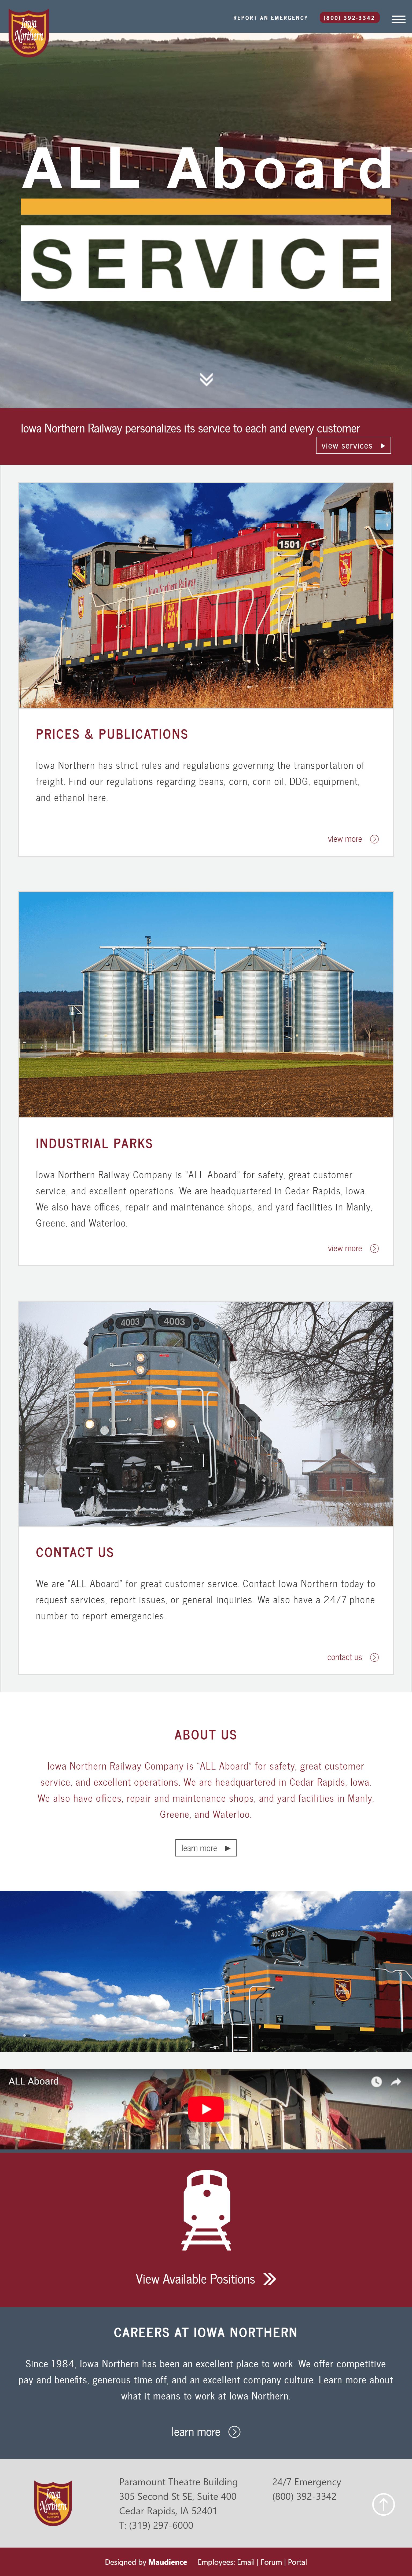 Iowa Northern Mobile Website